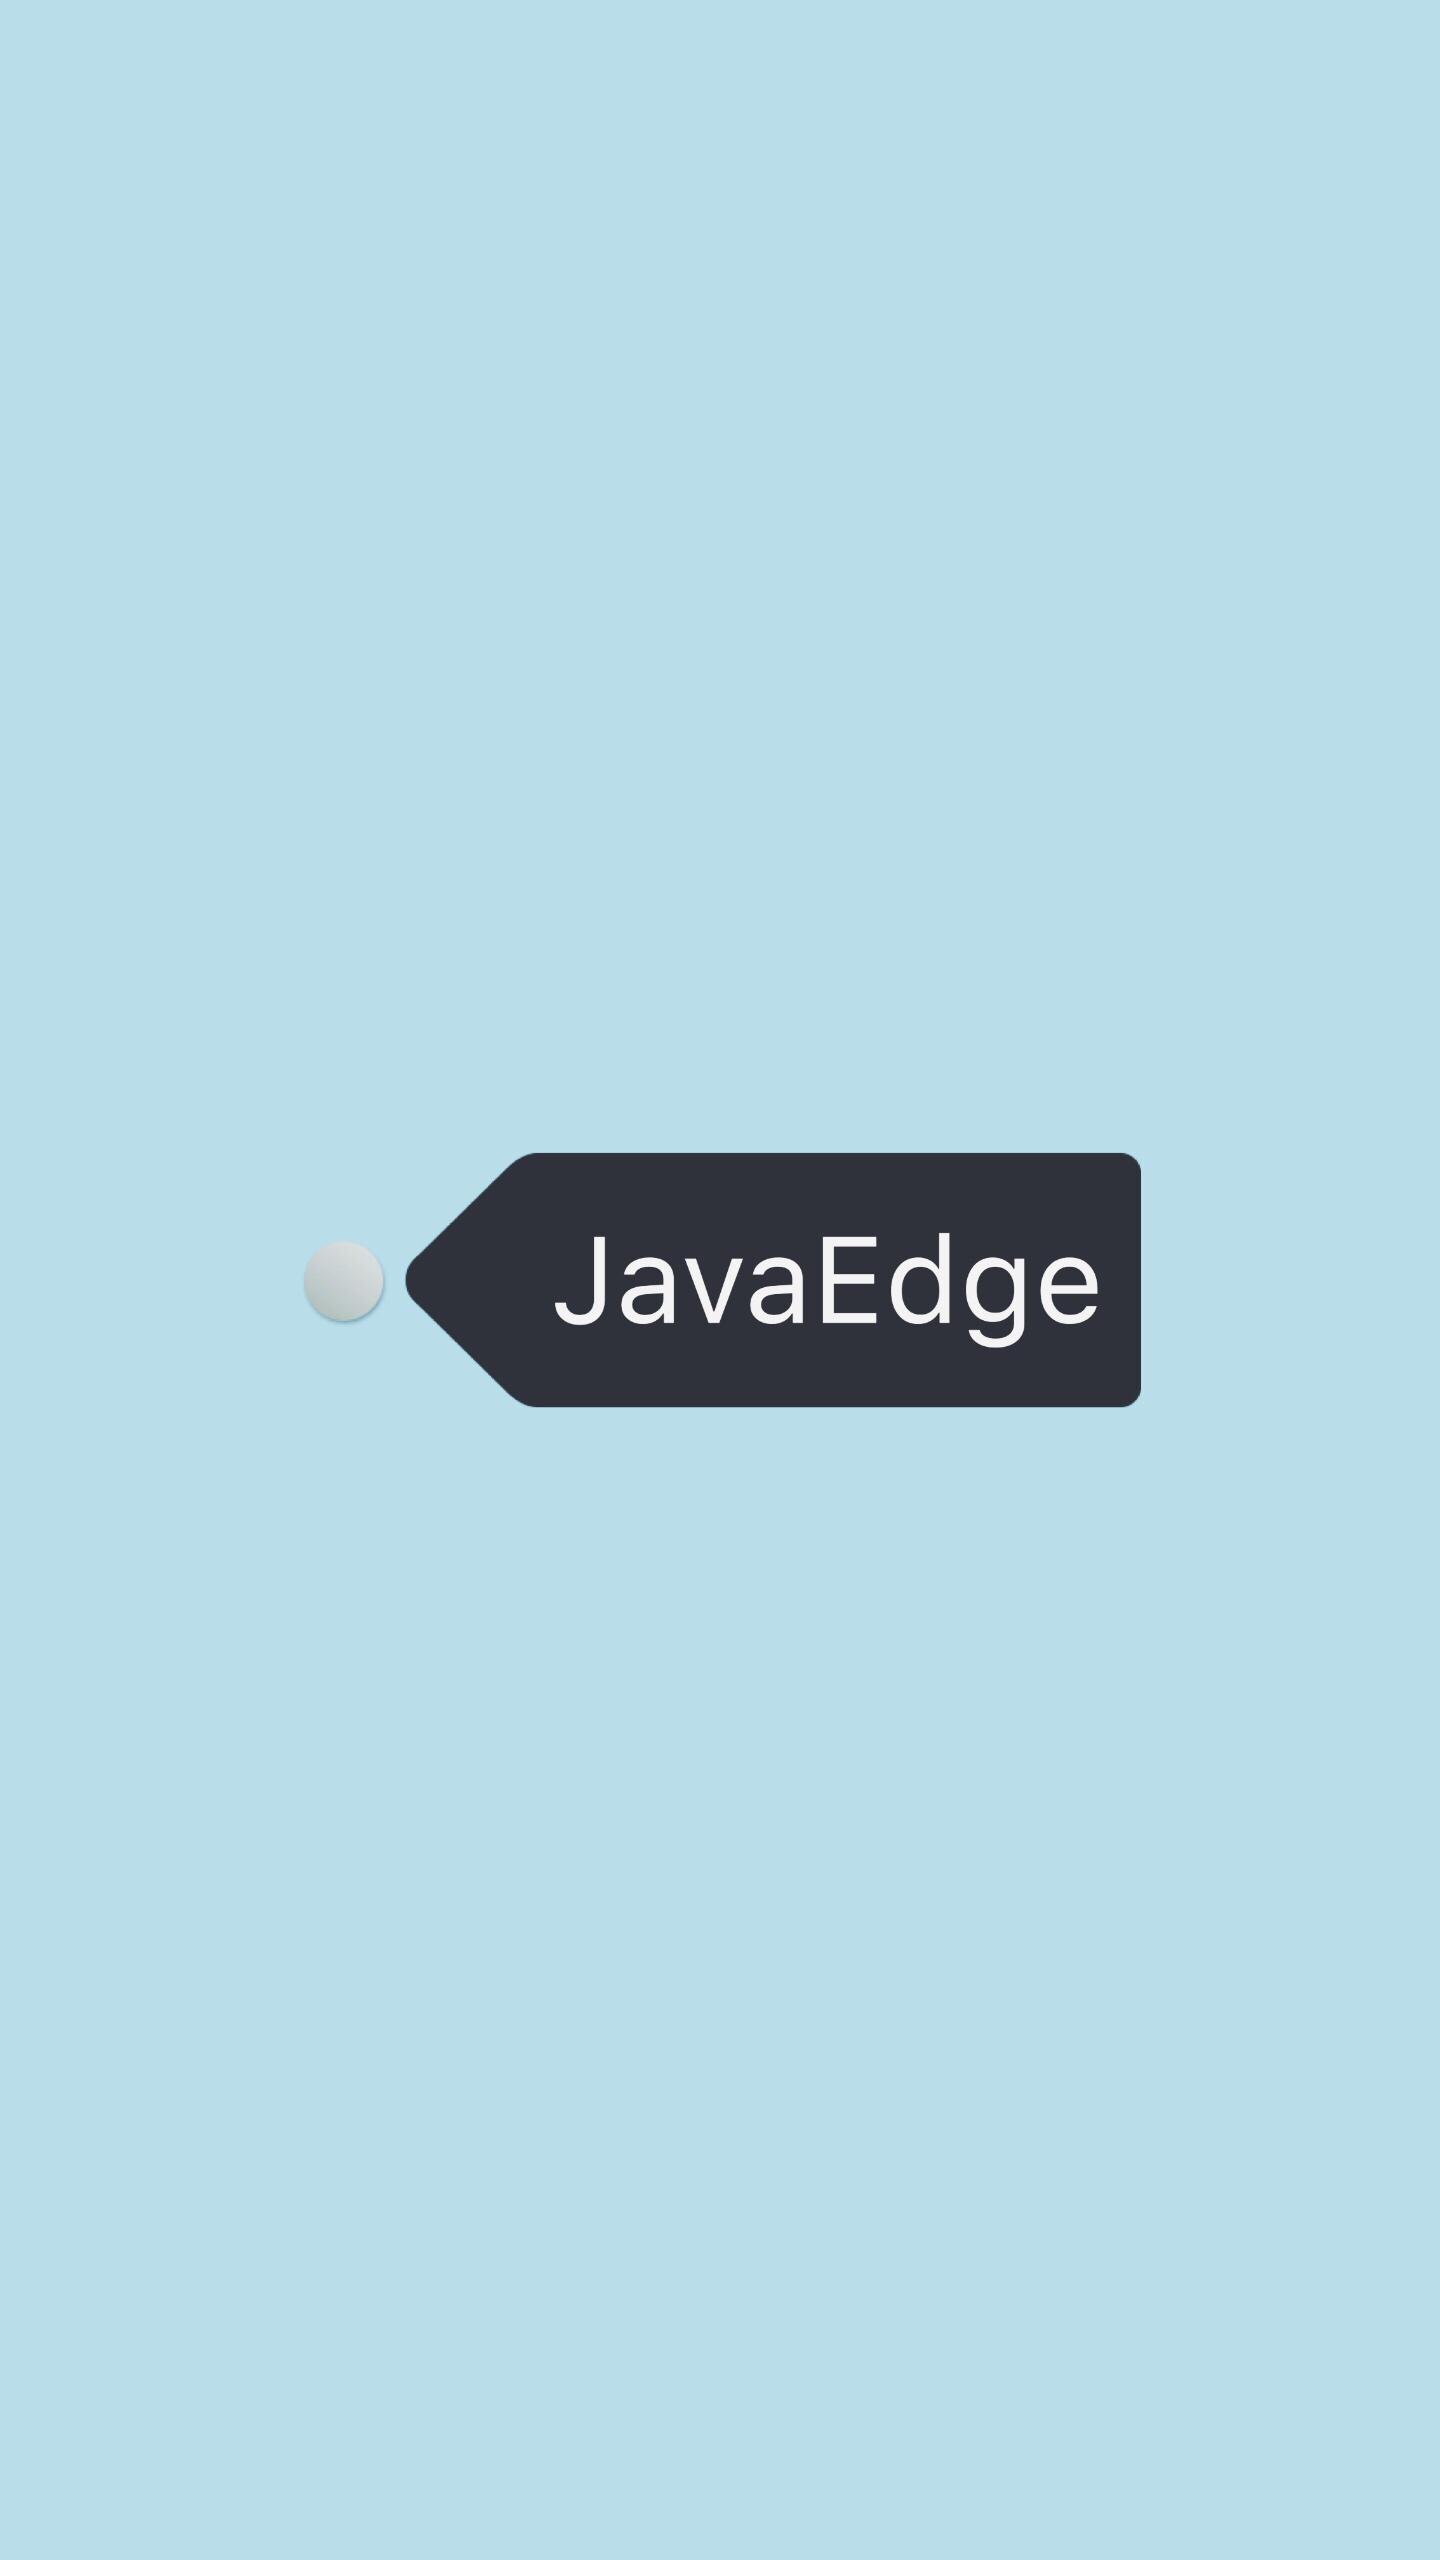 basic语言c语言-c语言开源软件-C语言程序 - 阿里云